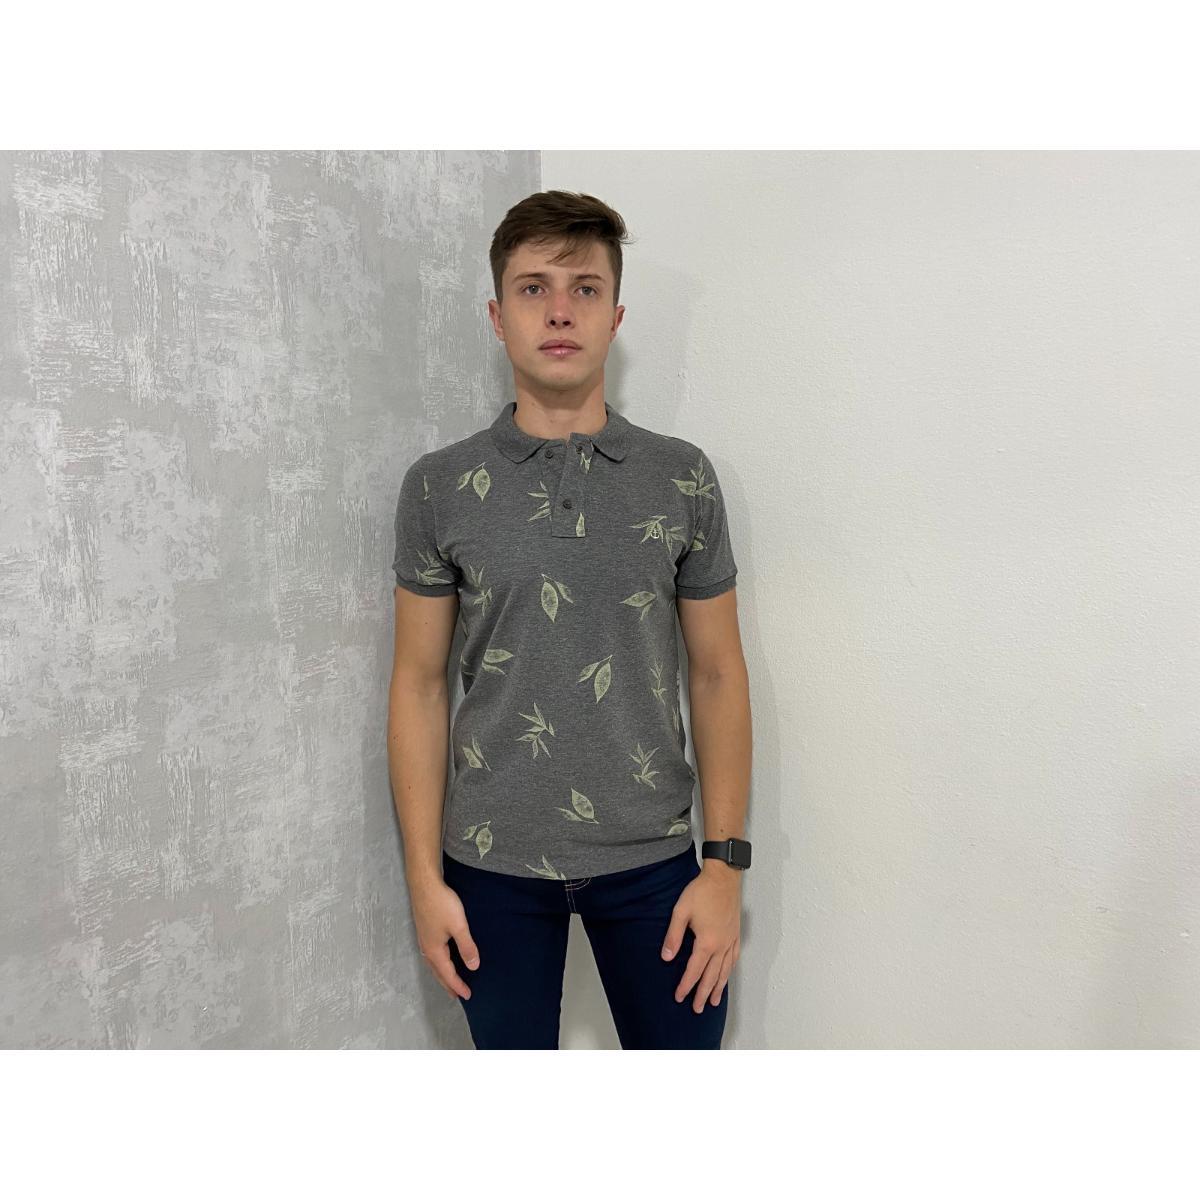 Camisa Masculina King & Joe Po09304 Grafite/mescla